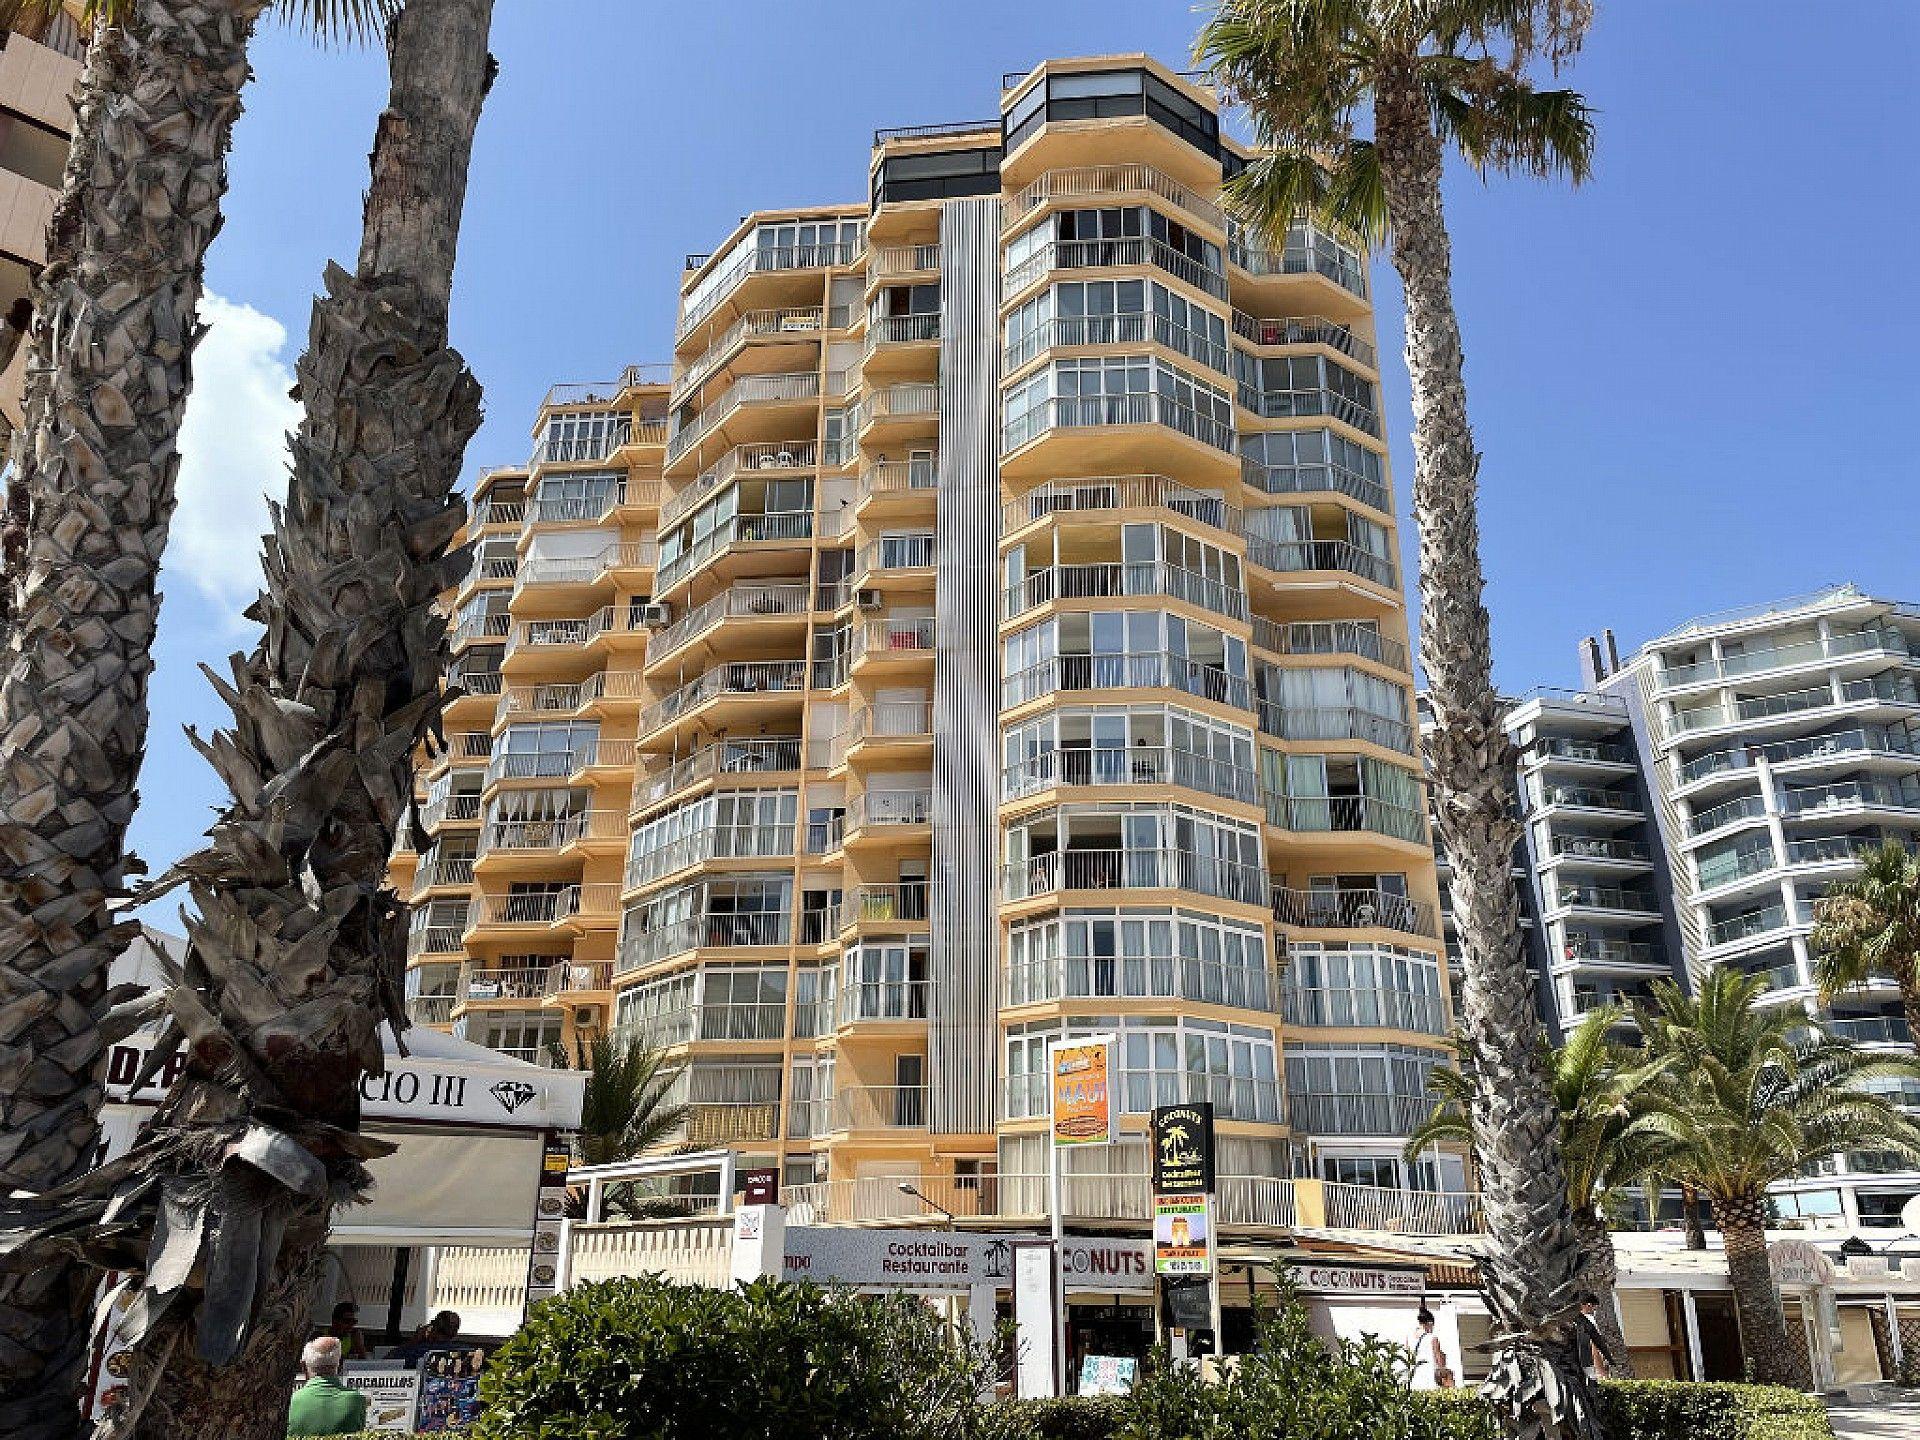 w_appartement-tekoop-costa-blanca-calpe-a1068-spanje3-1.jpg